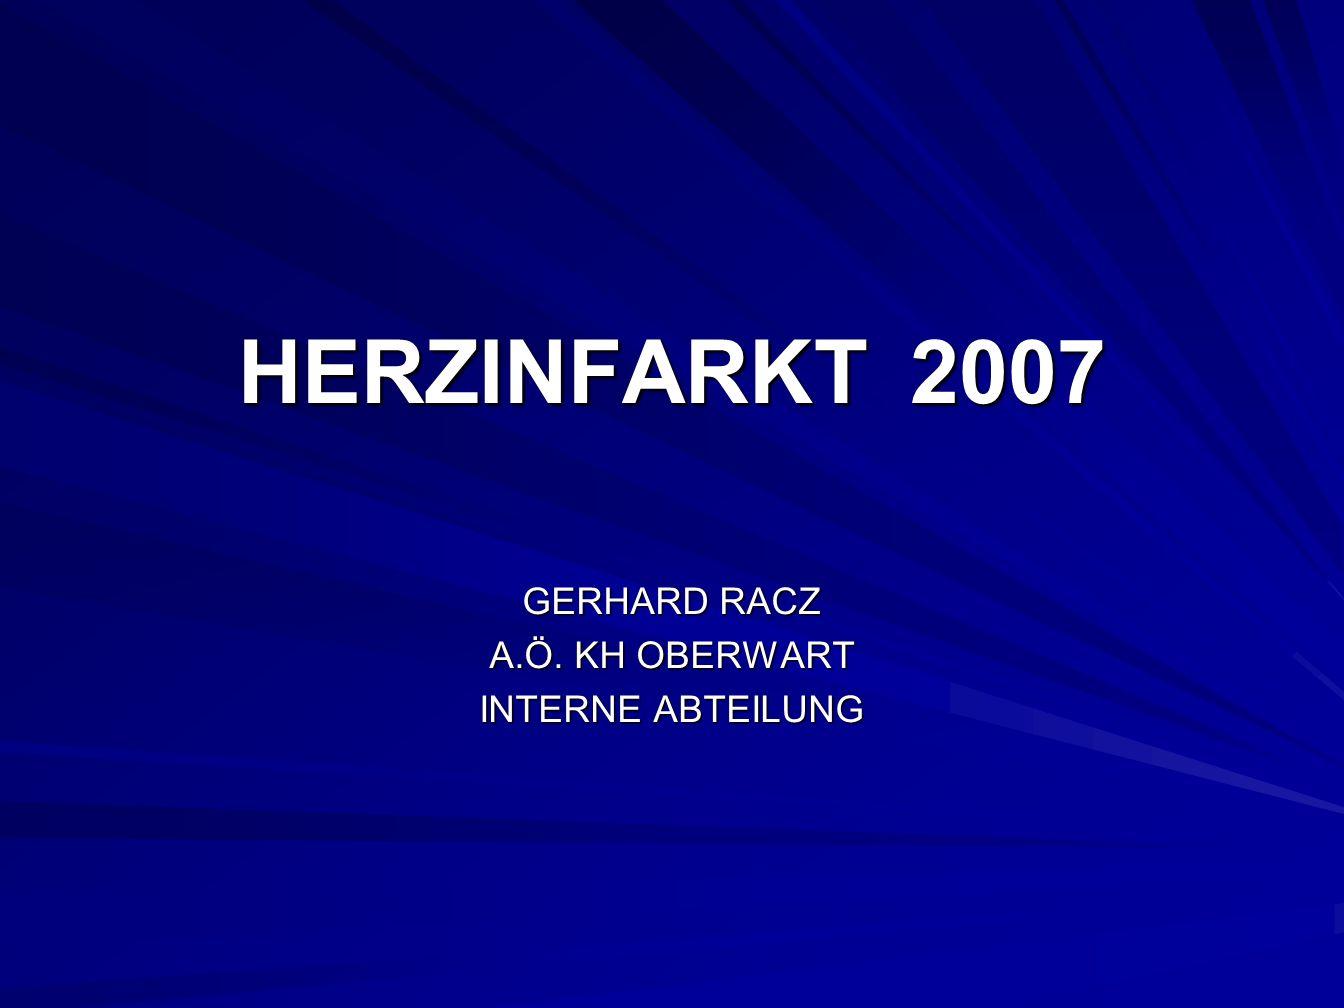 GERHARD RACZ A.Ö. KH OBERWART INTERNE ABTEILUNG